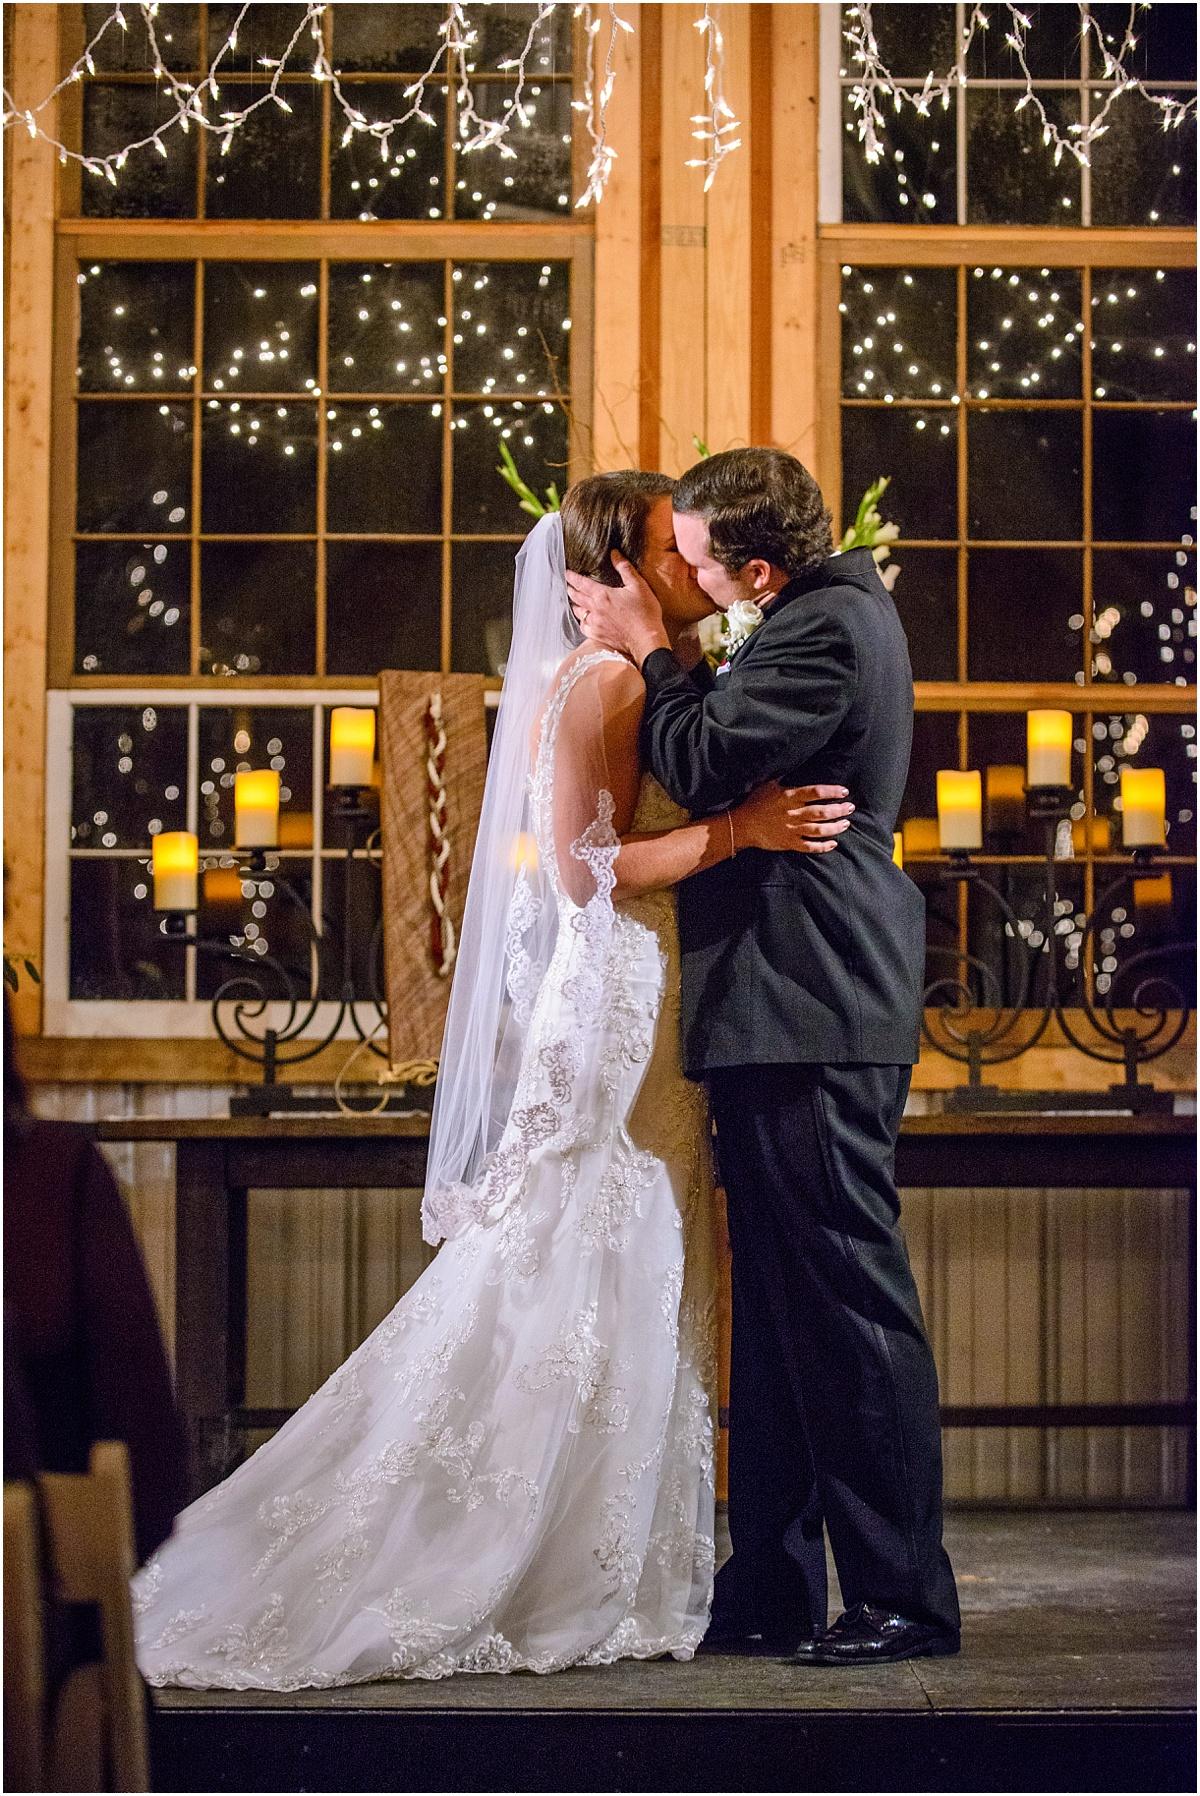 Greg Smit Photography Nashville wedding photographer Tomlinson Family Farm_0070